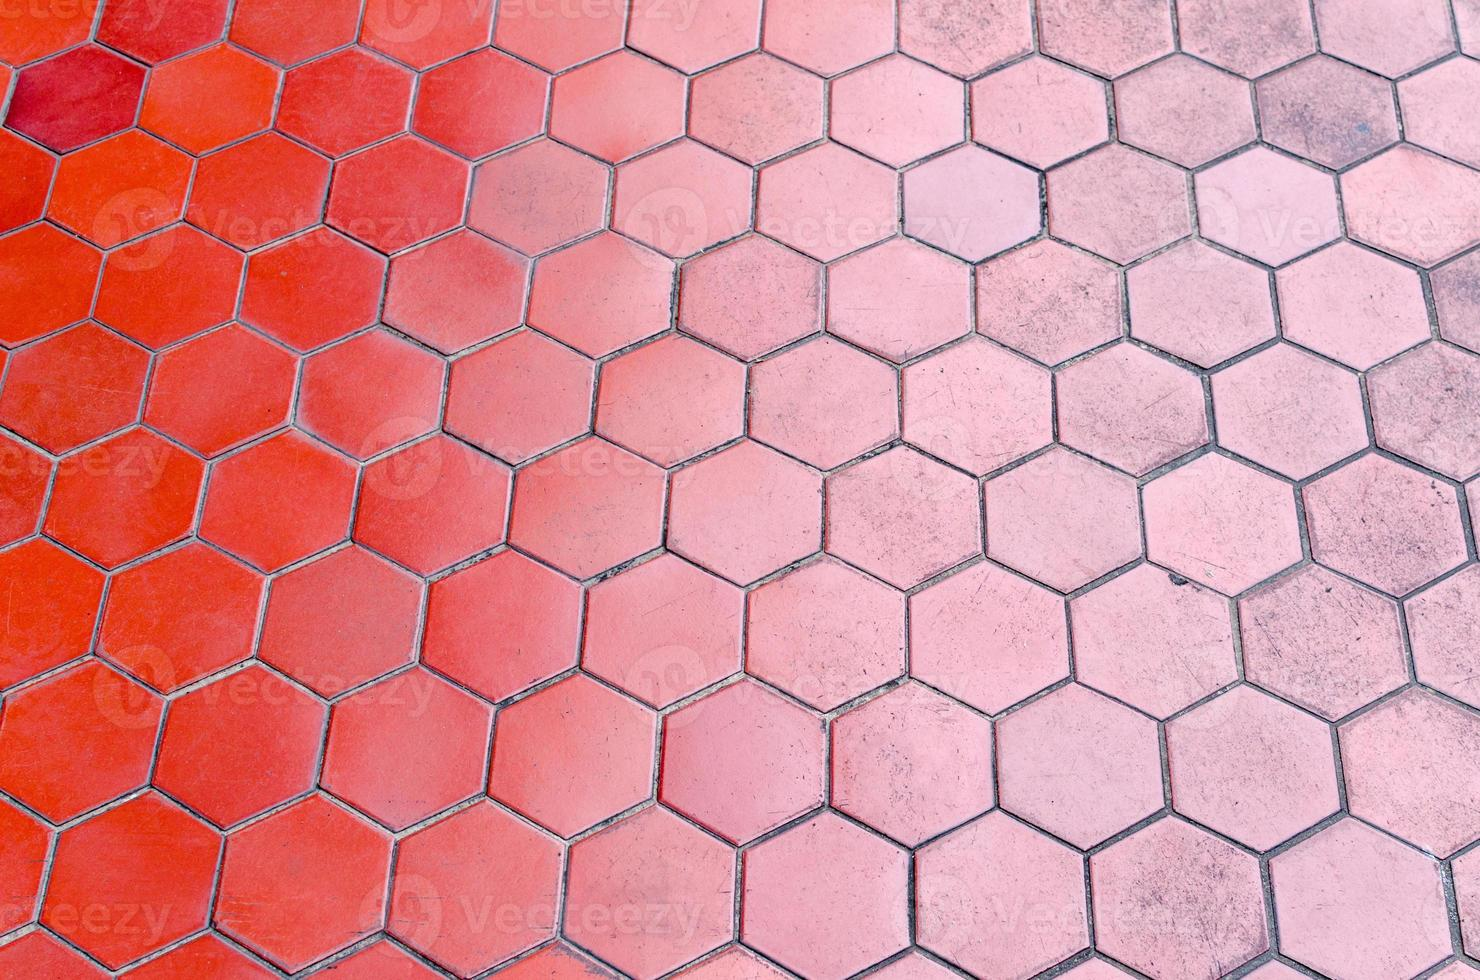 red tile floor gradient two tone photo